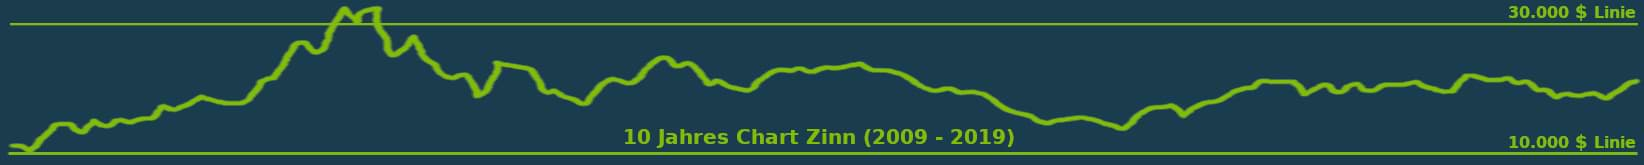 zinn 10 Jahres Kurs chart